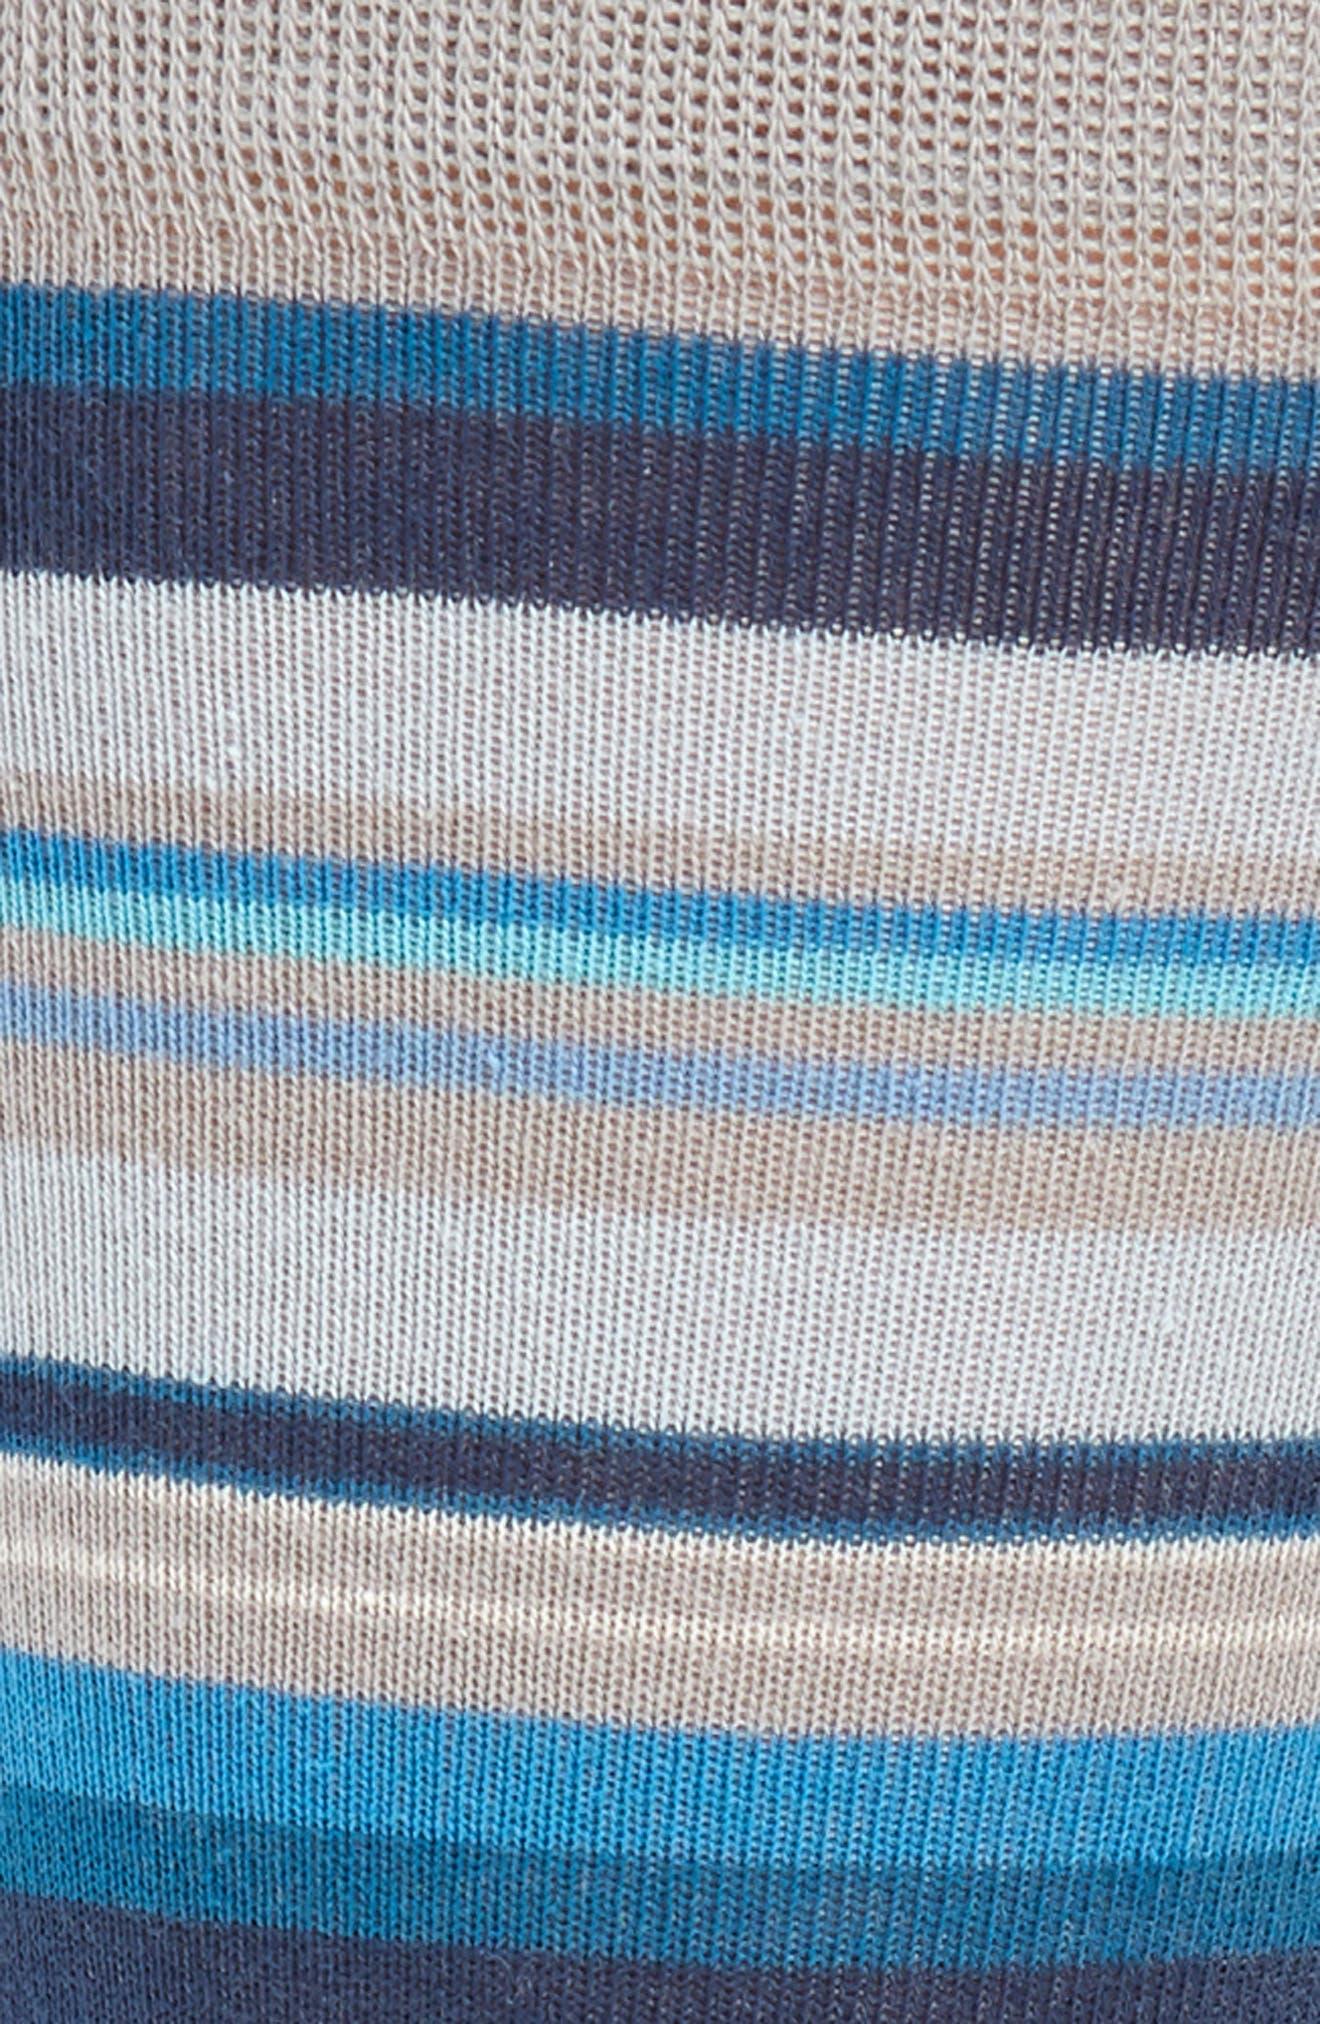 Variegated Stripe Socks,                             Alternate thumbnail 2, color,                             030